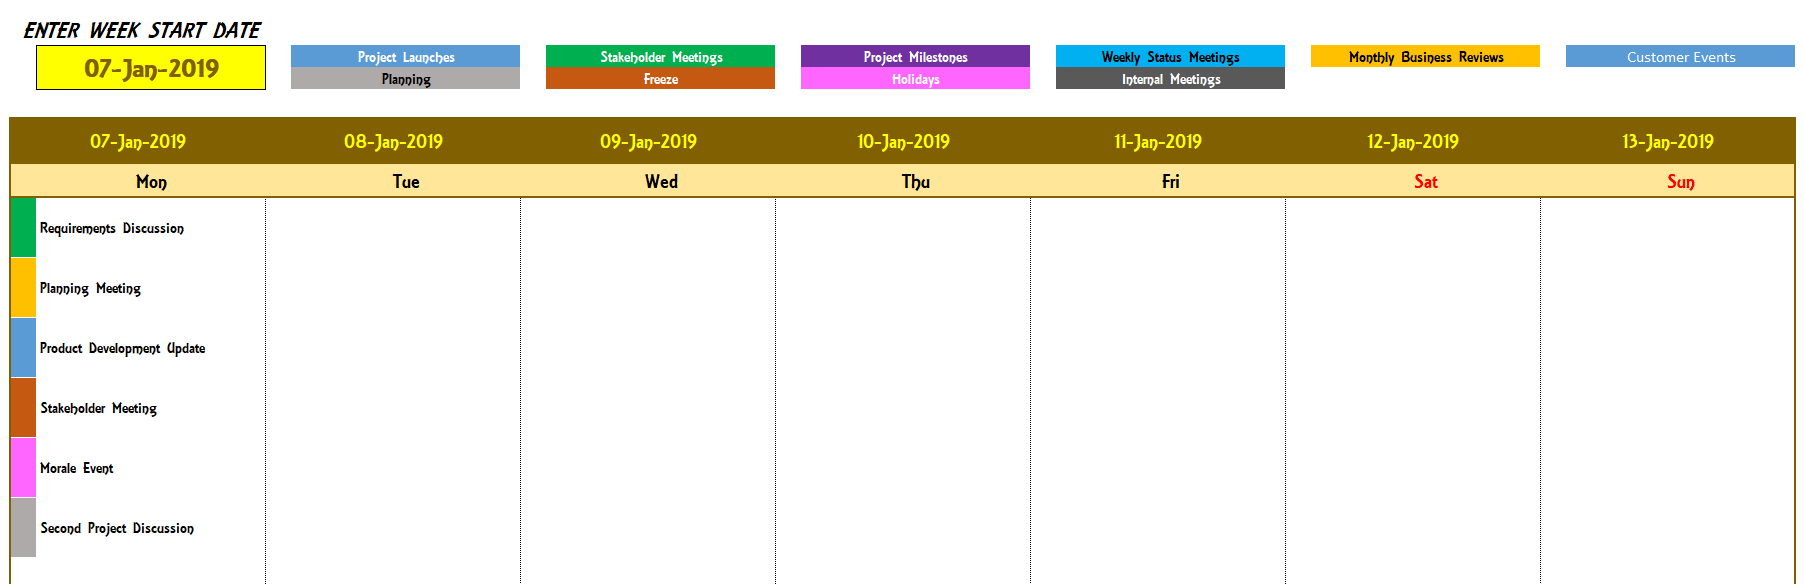 Excel Calendar Template - Excel Calendar 2019, 2020 Or Any Year in Yearly Event Calendar Template Excel